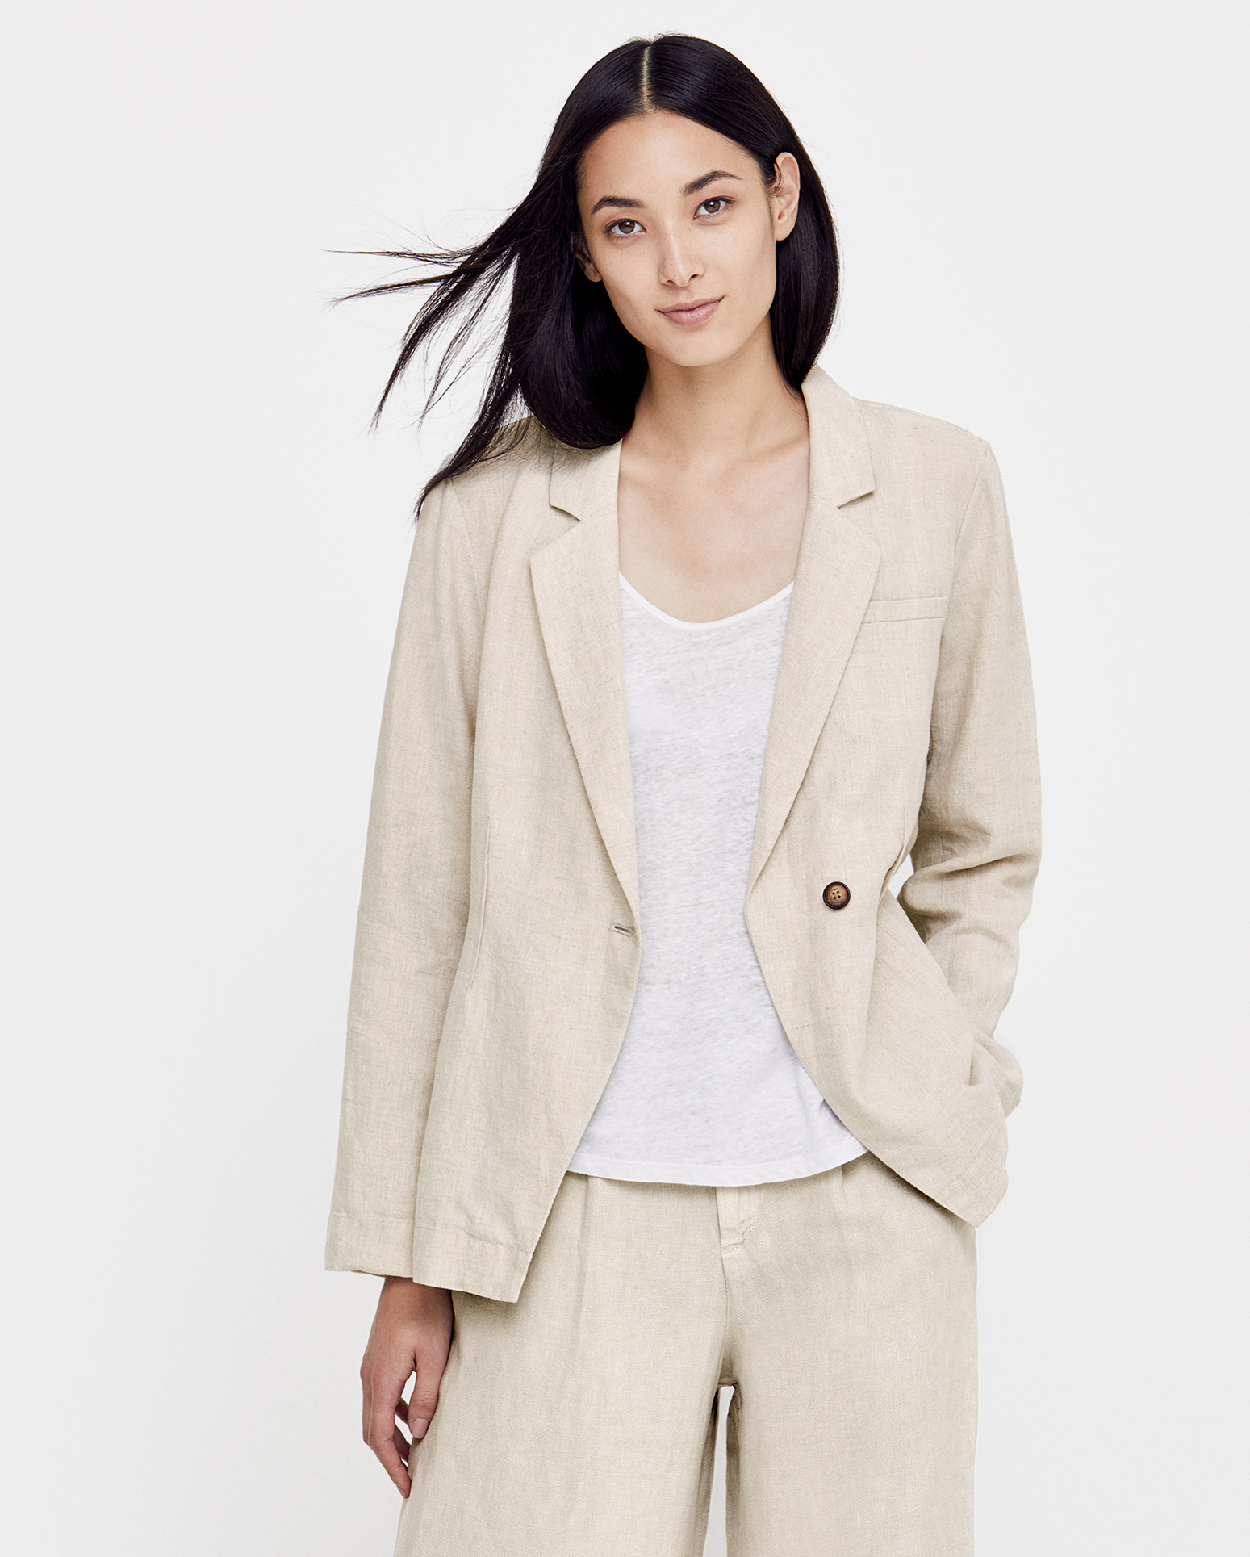 Elegance meets warm-weather comfort in our classic lightweight linen tee  shirt for women.